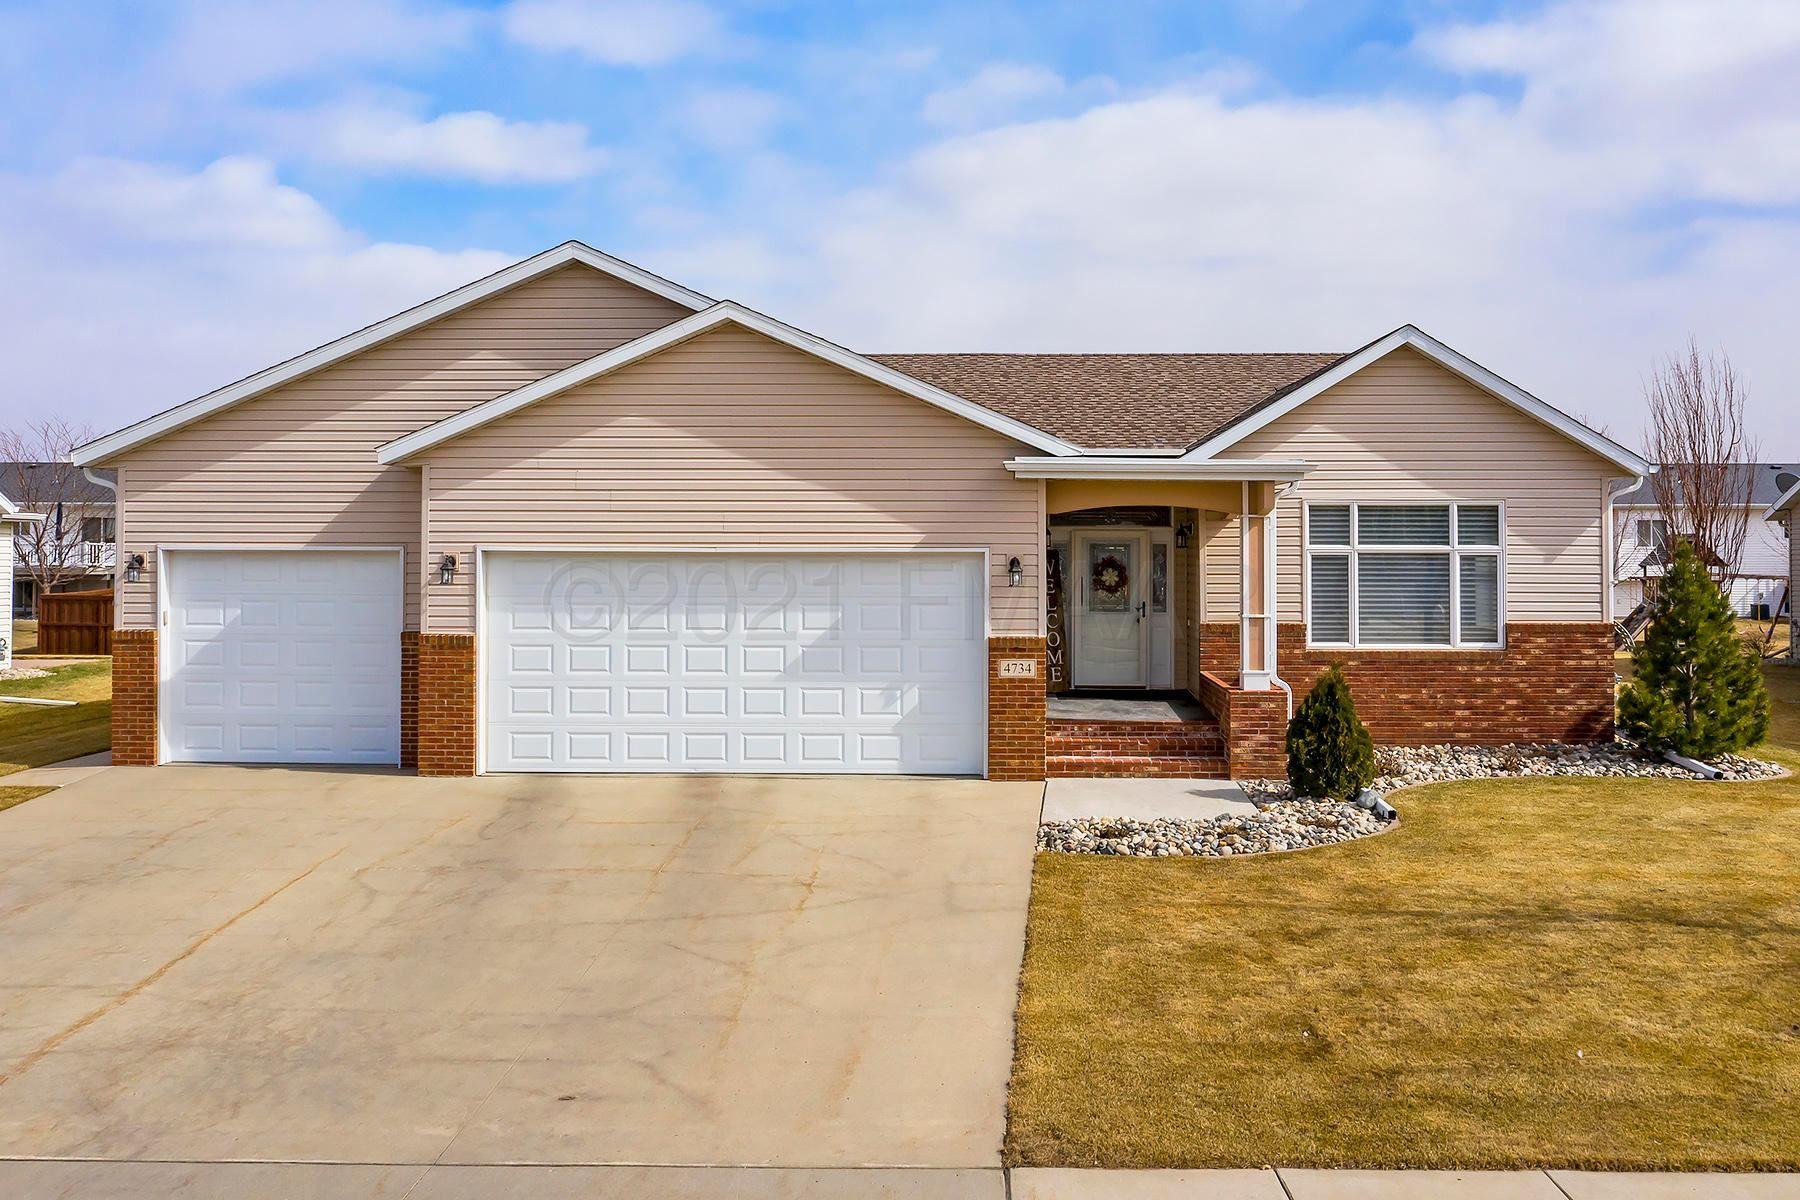 4734 ARBOR Court S, Fargo, ND 58104 - #: 21-1599